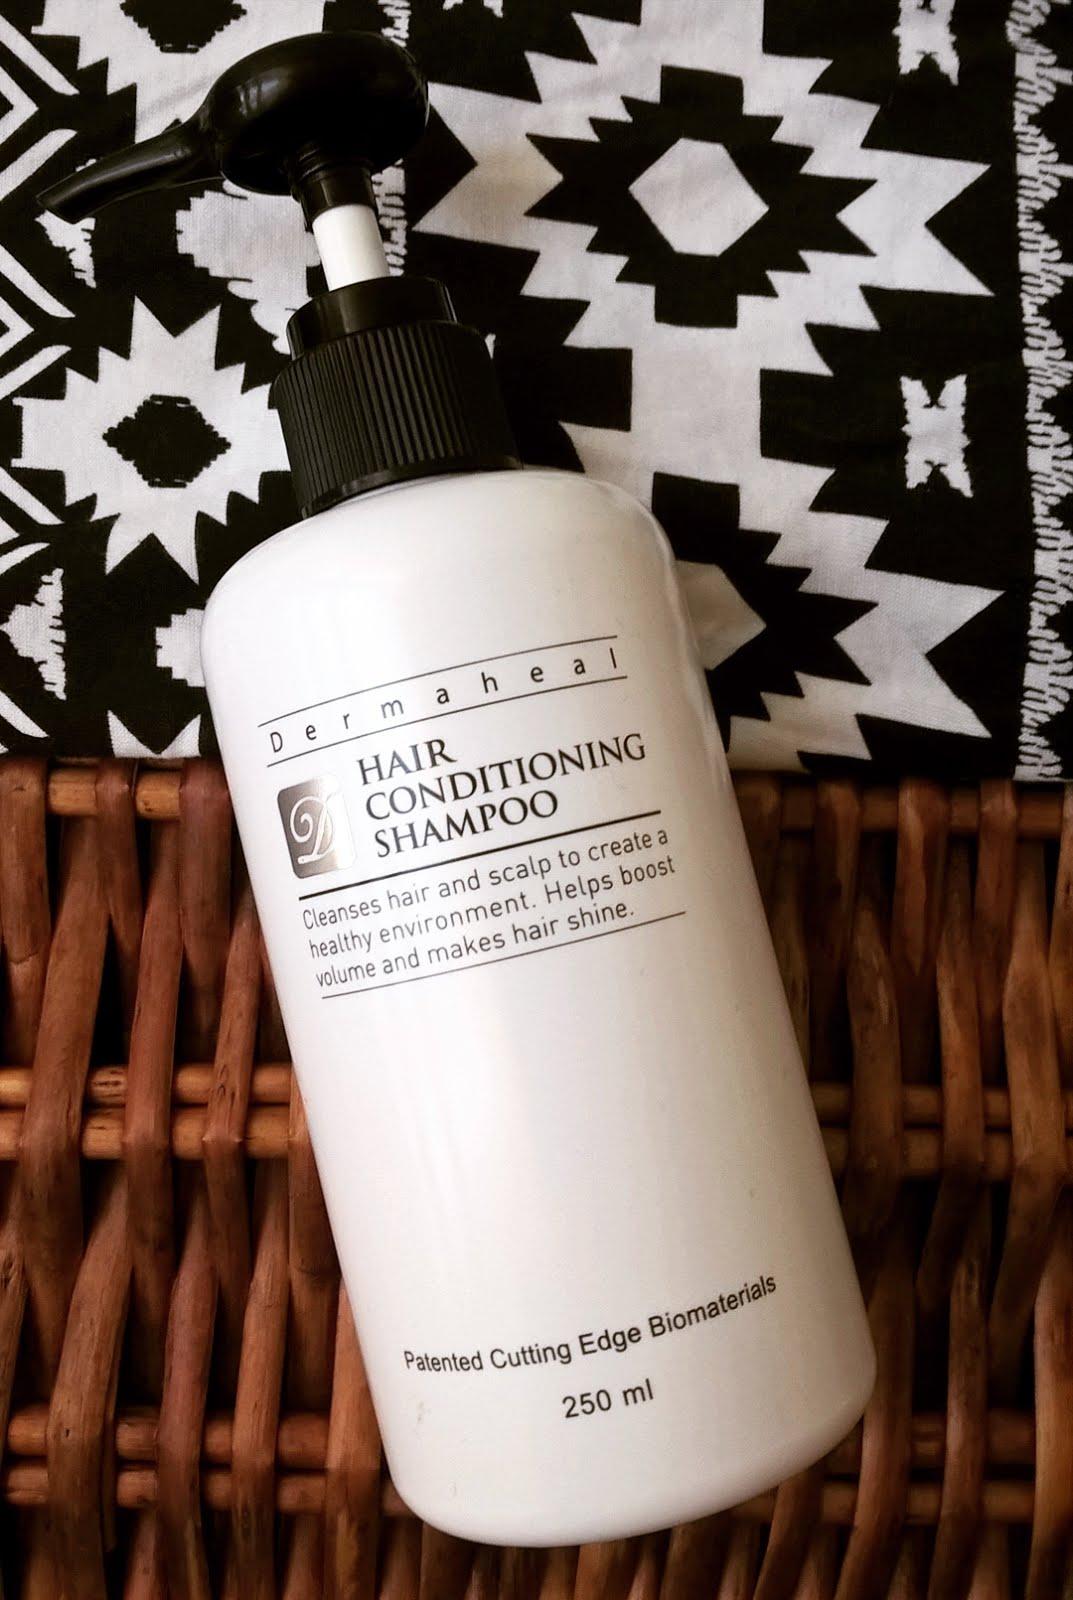 Szampon Dermaheal Hair Conditioning opinie blog recenzja